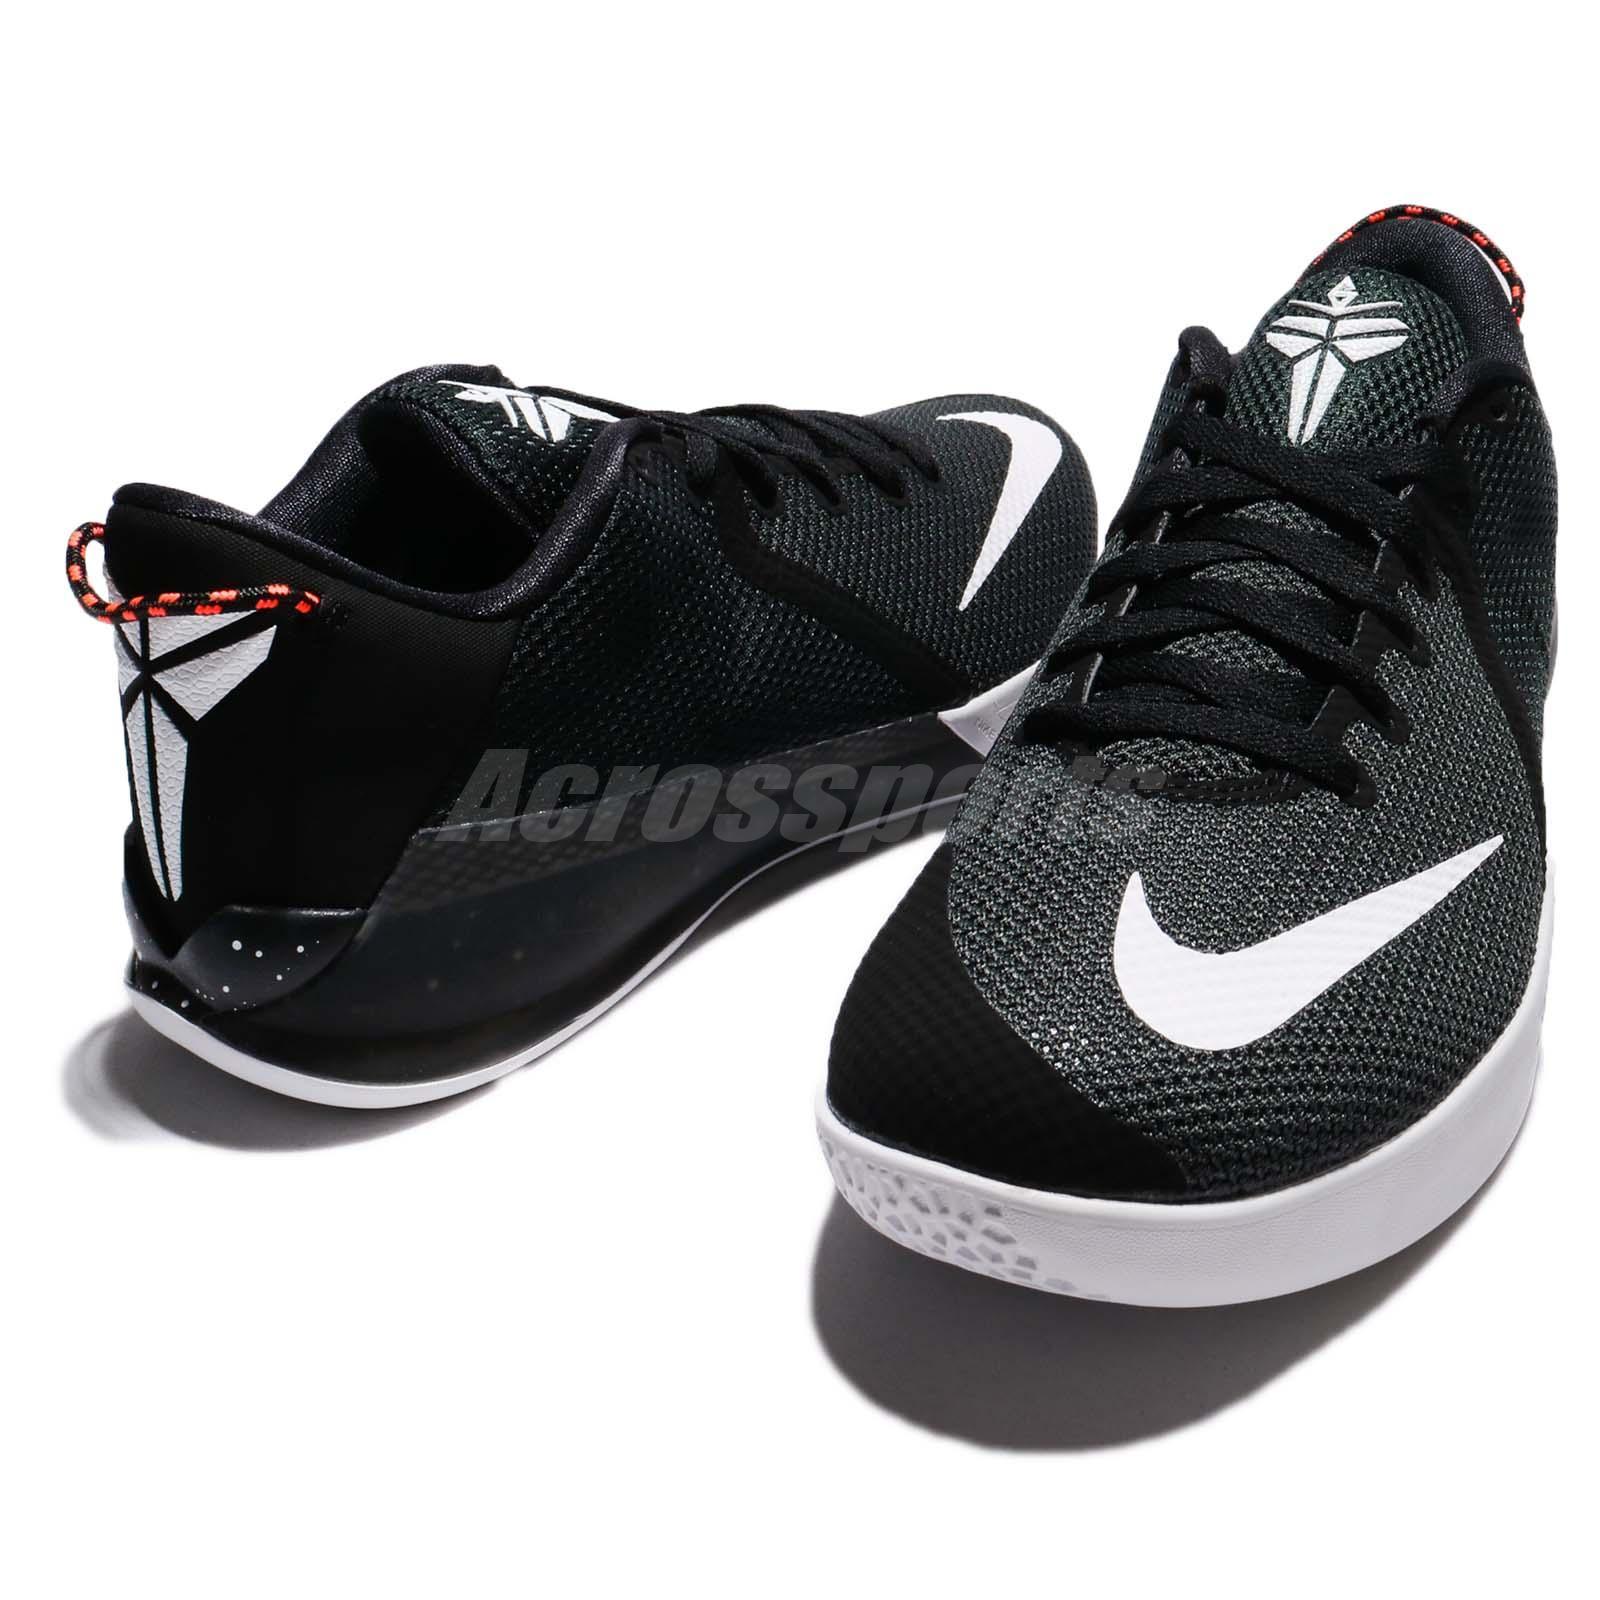 89b4f3bd2156 Nike Zoom Kobe Venomenon 6 EP VI Black Bryant White Men Bask .